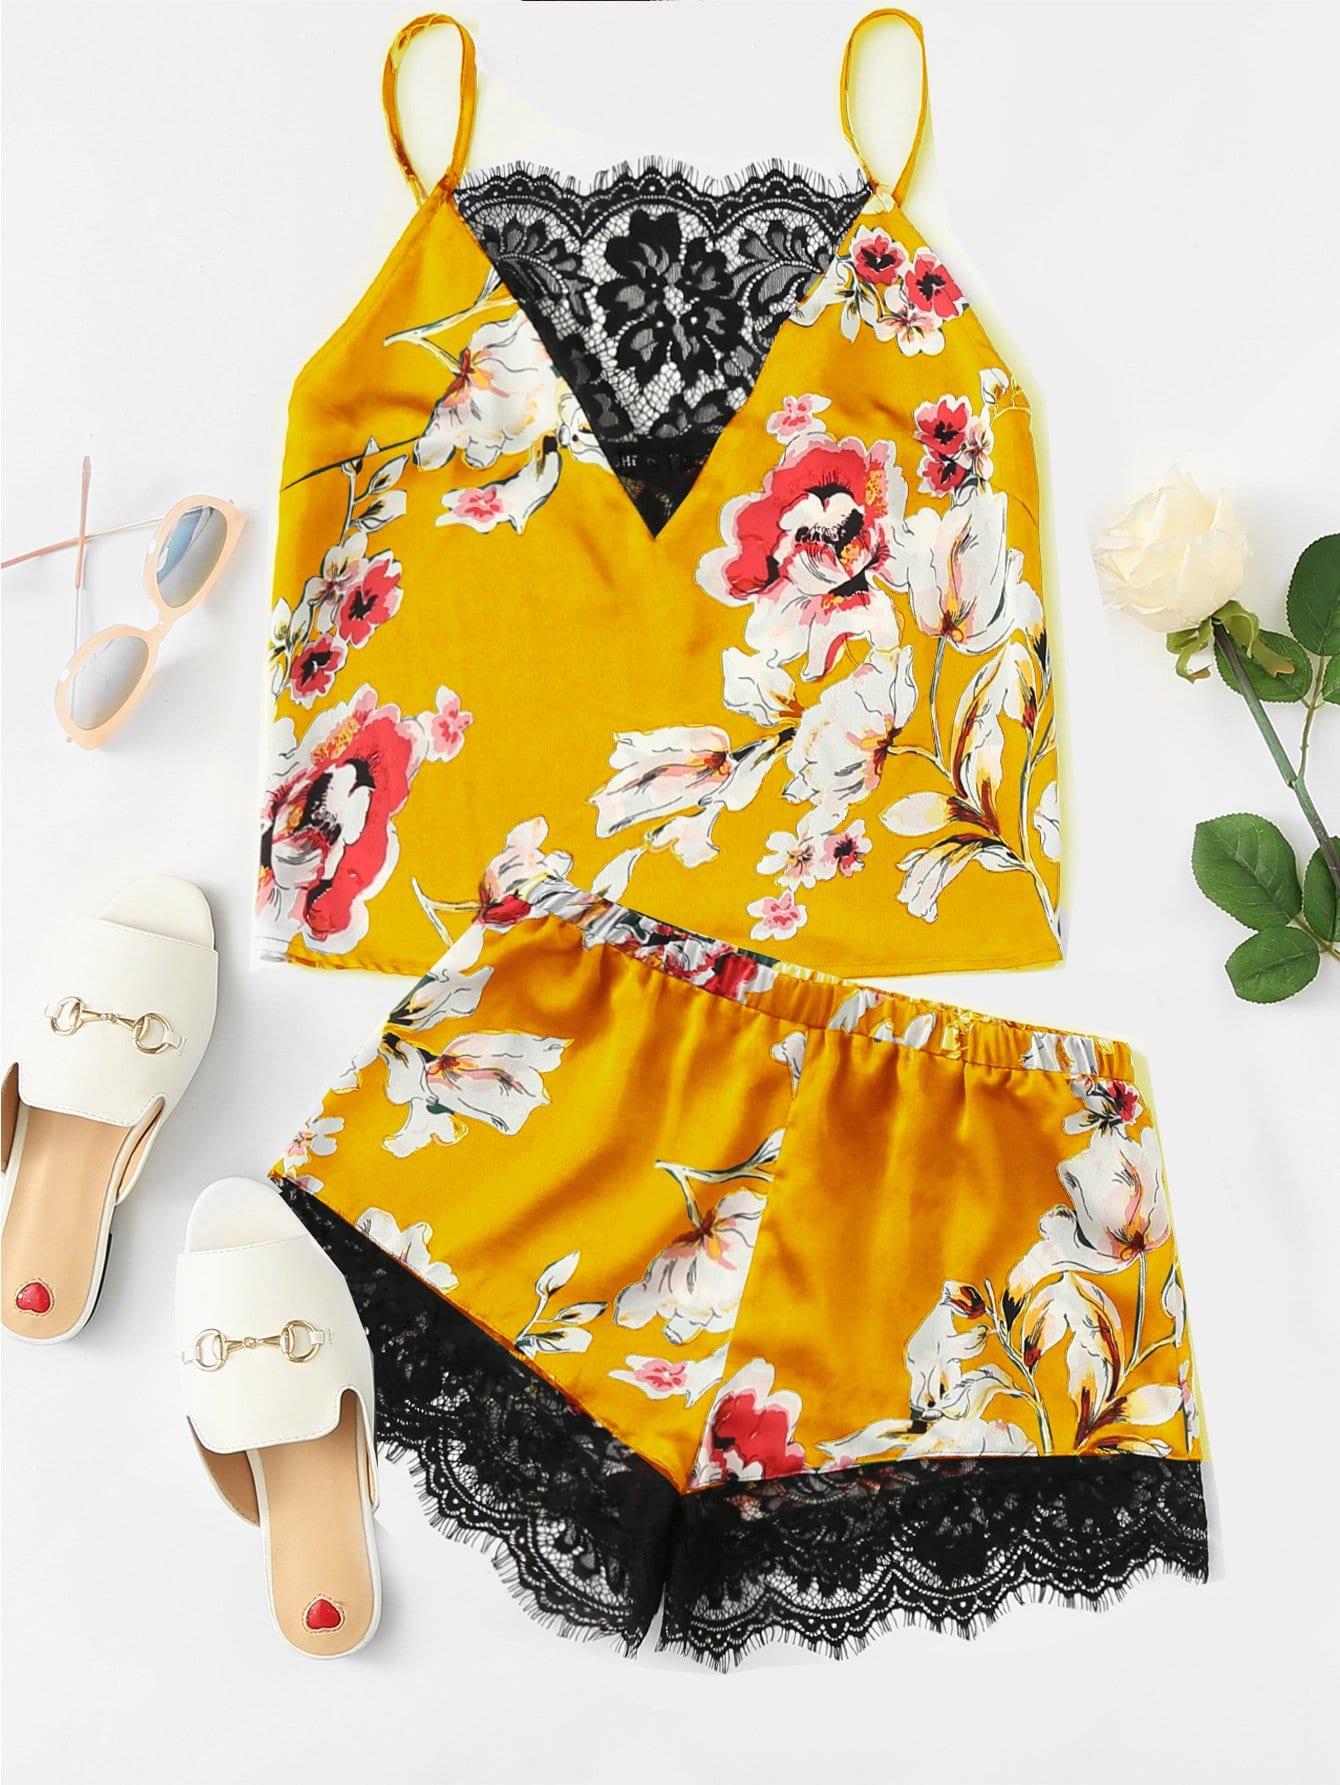 Floral Print Lace Insert Cami Top & Shorts PJ Set lace insert flower print cami top